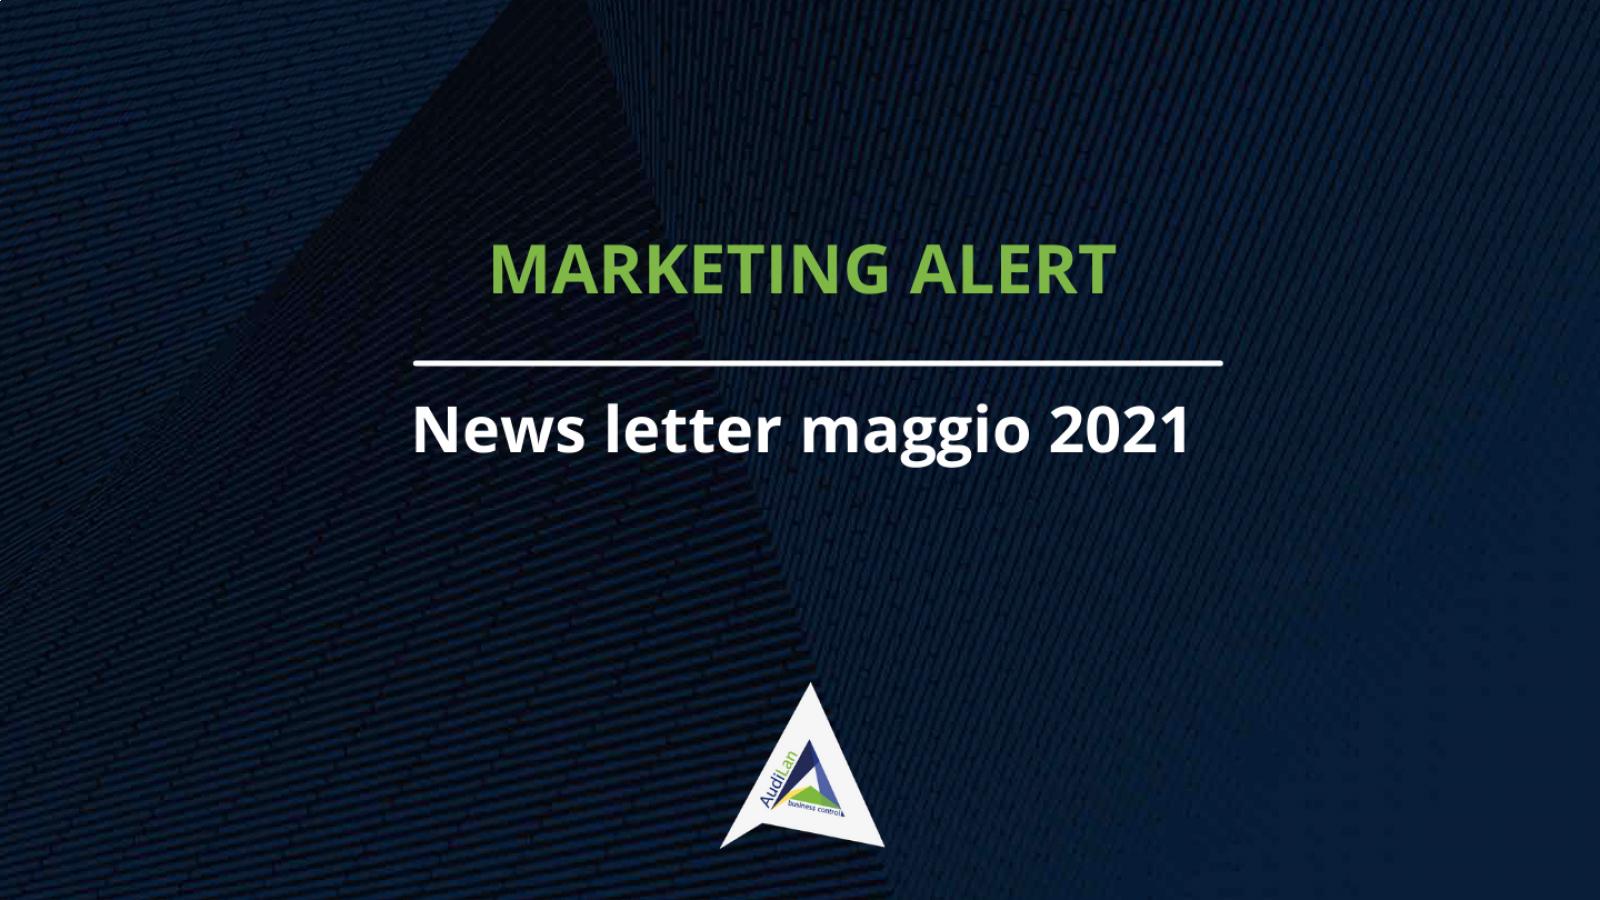 Marketing alert